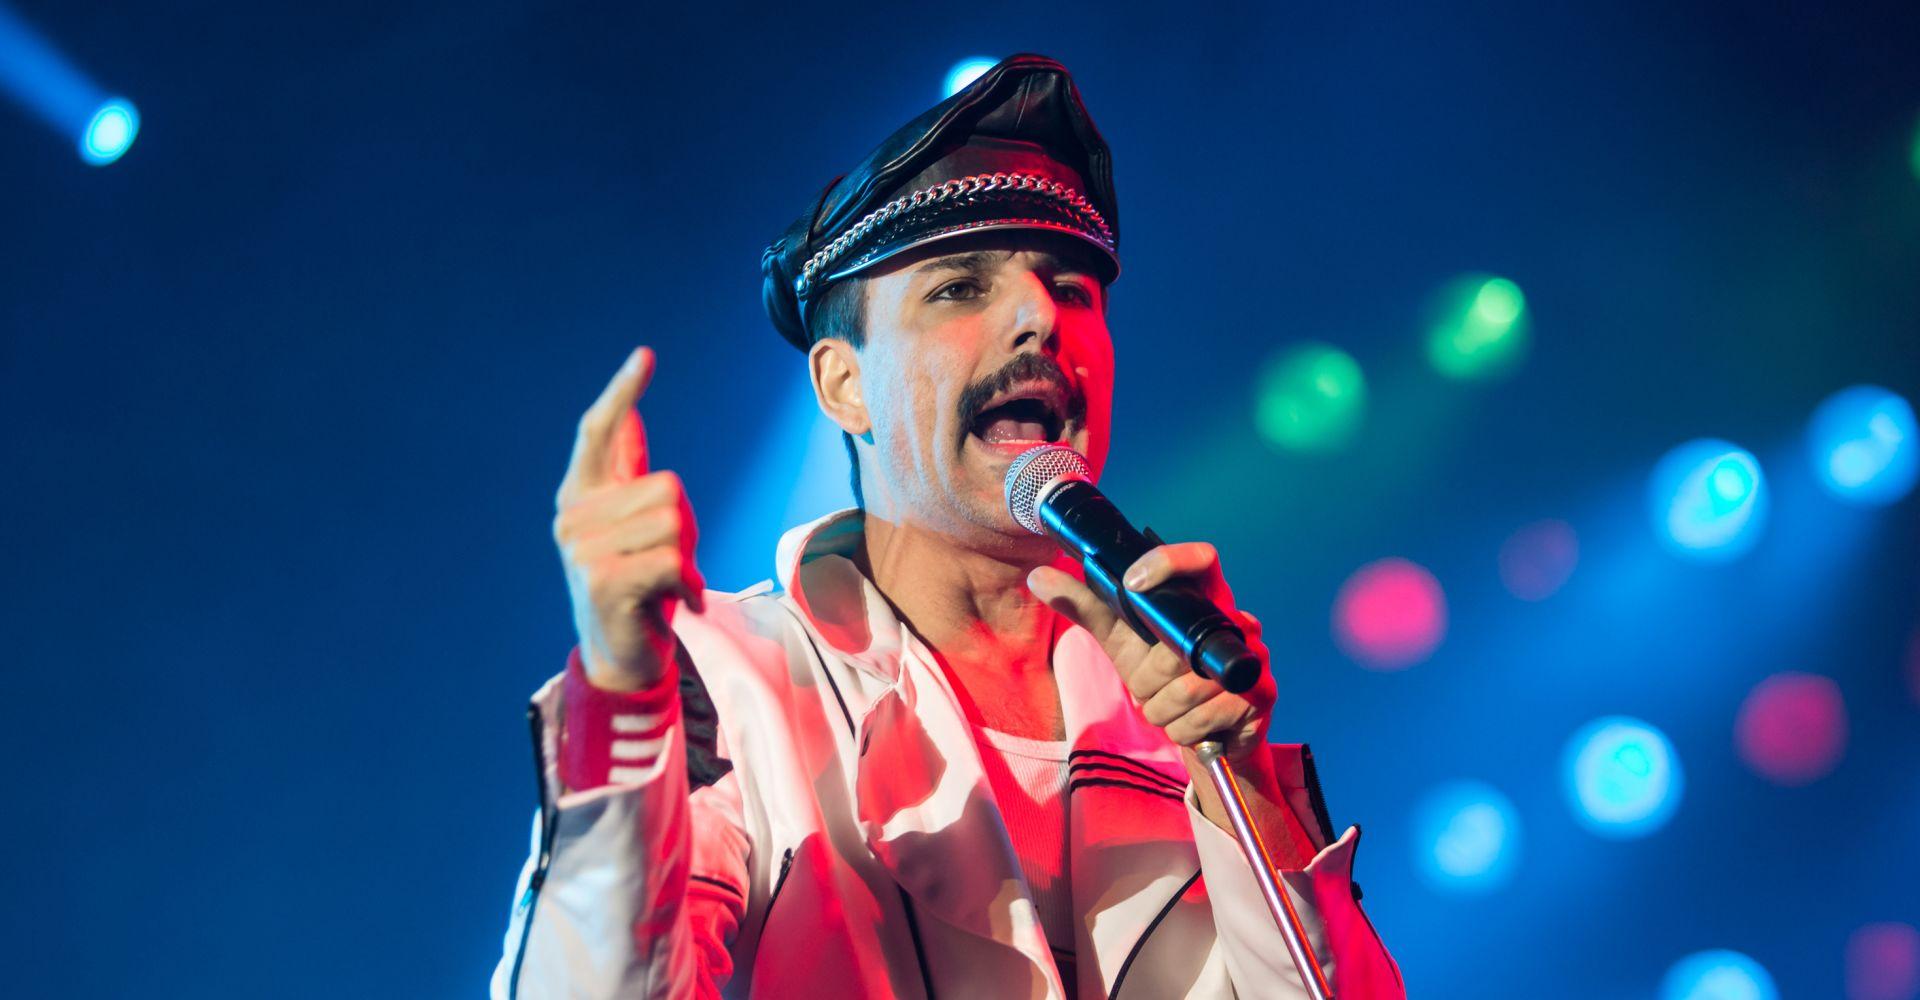 Big Sam loves Queen, especially Bohemian Rhapsody